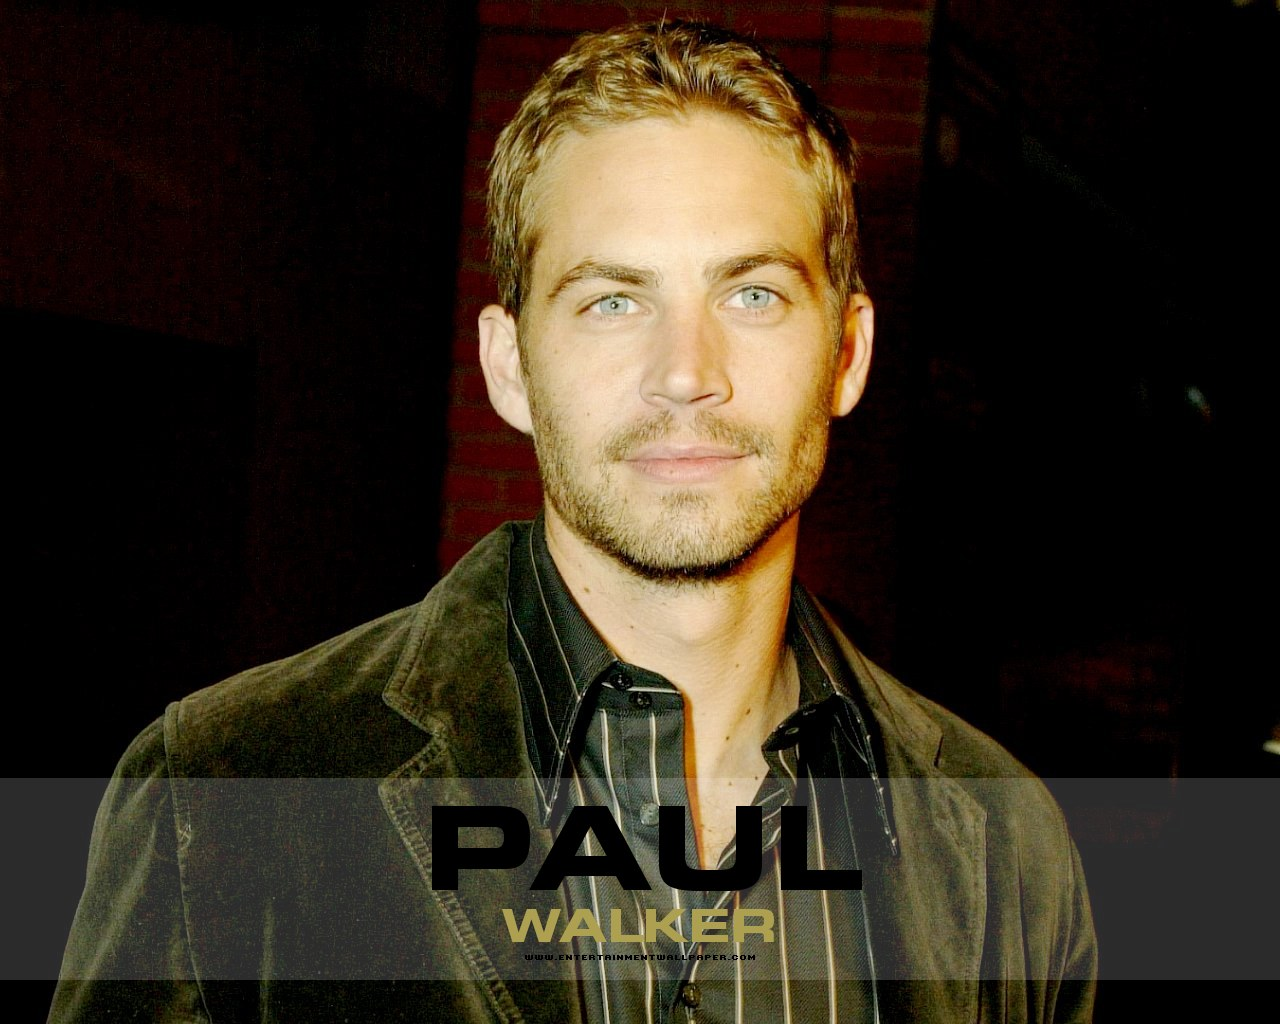 http://2.bp.blogspot.com/-UUhFvaJXEX8/TiQro9NCG9I/AAAAAAAAFW0/vmeOeK1GBdE/s1600/Paul-Walker--paul-walker-646817_1280_1024.jpg